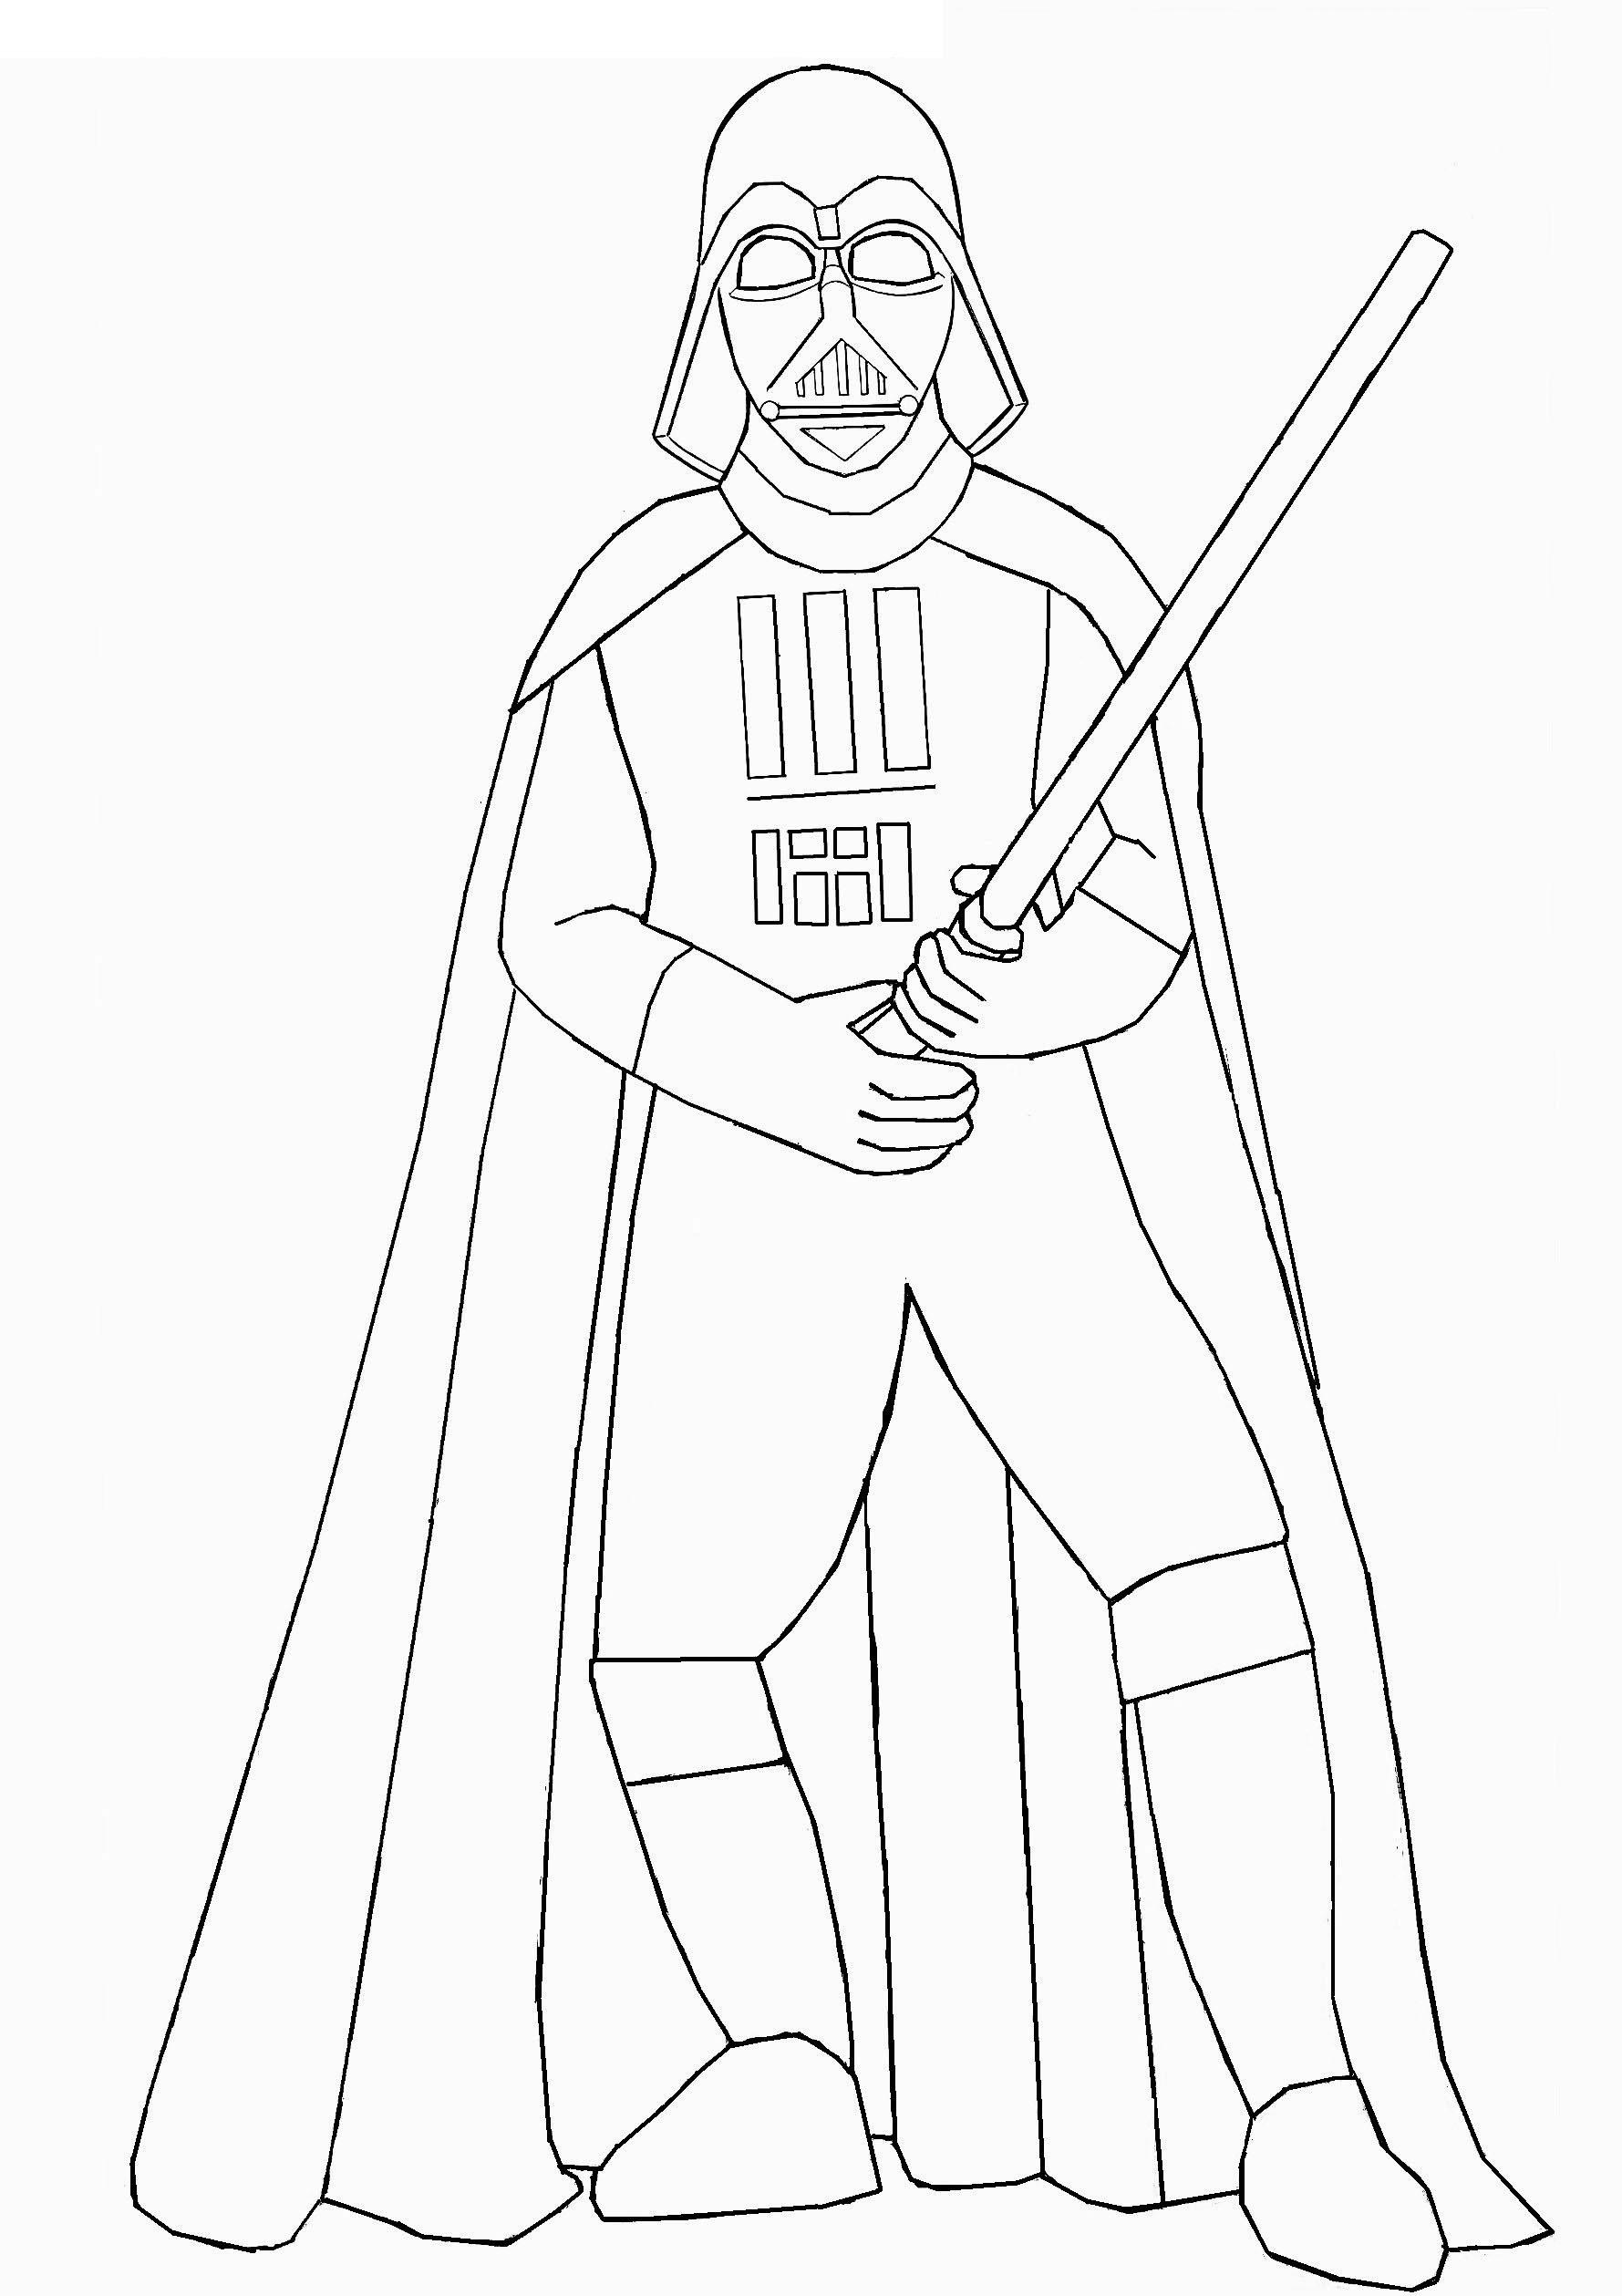 Vader Lightsaber Coloring Pages